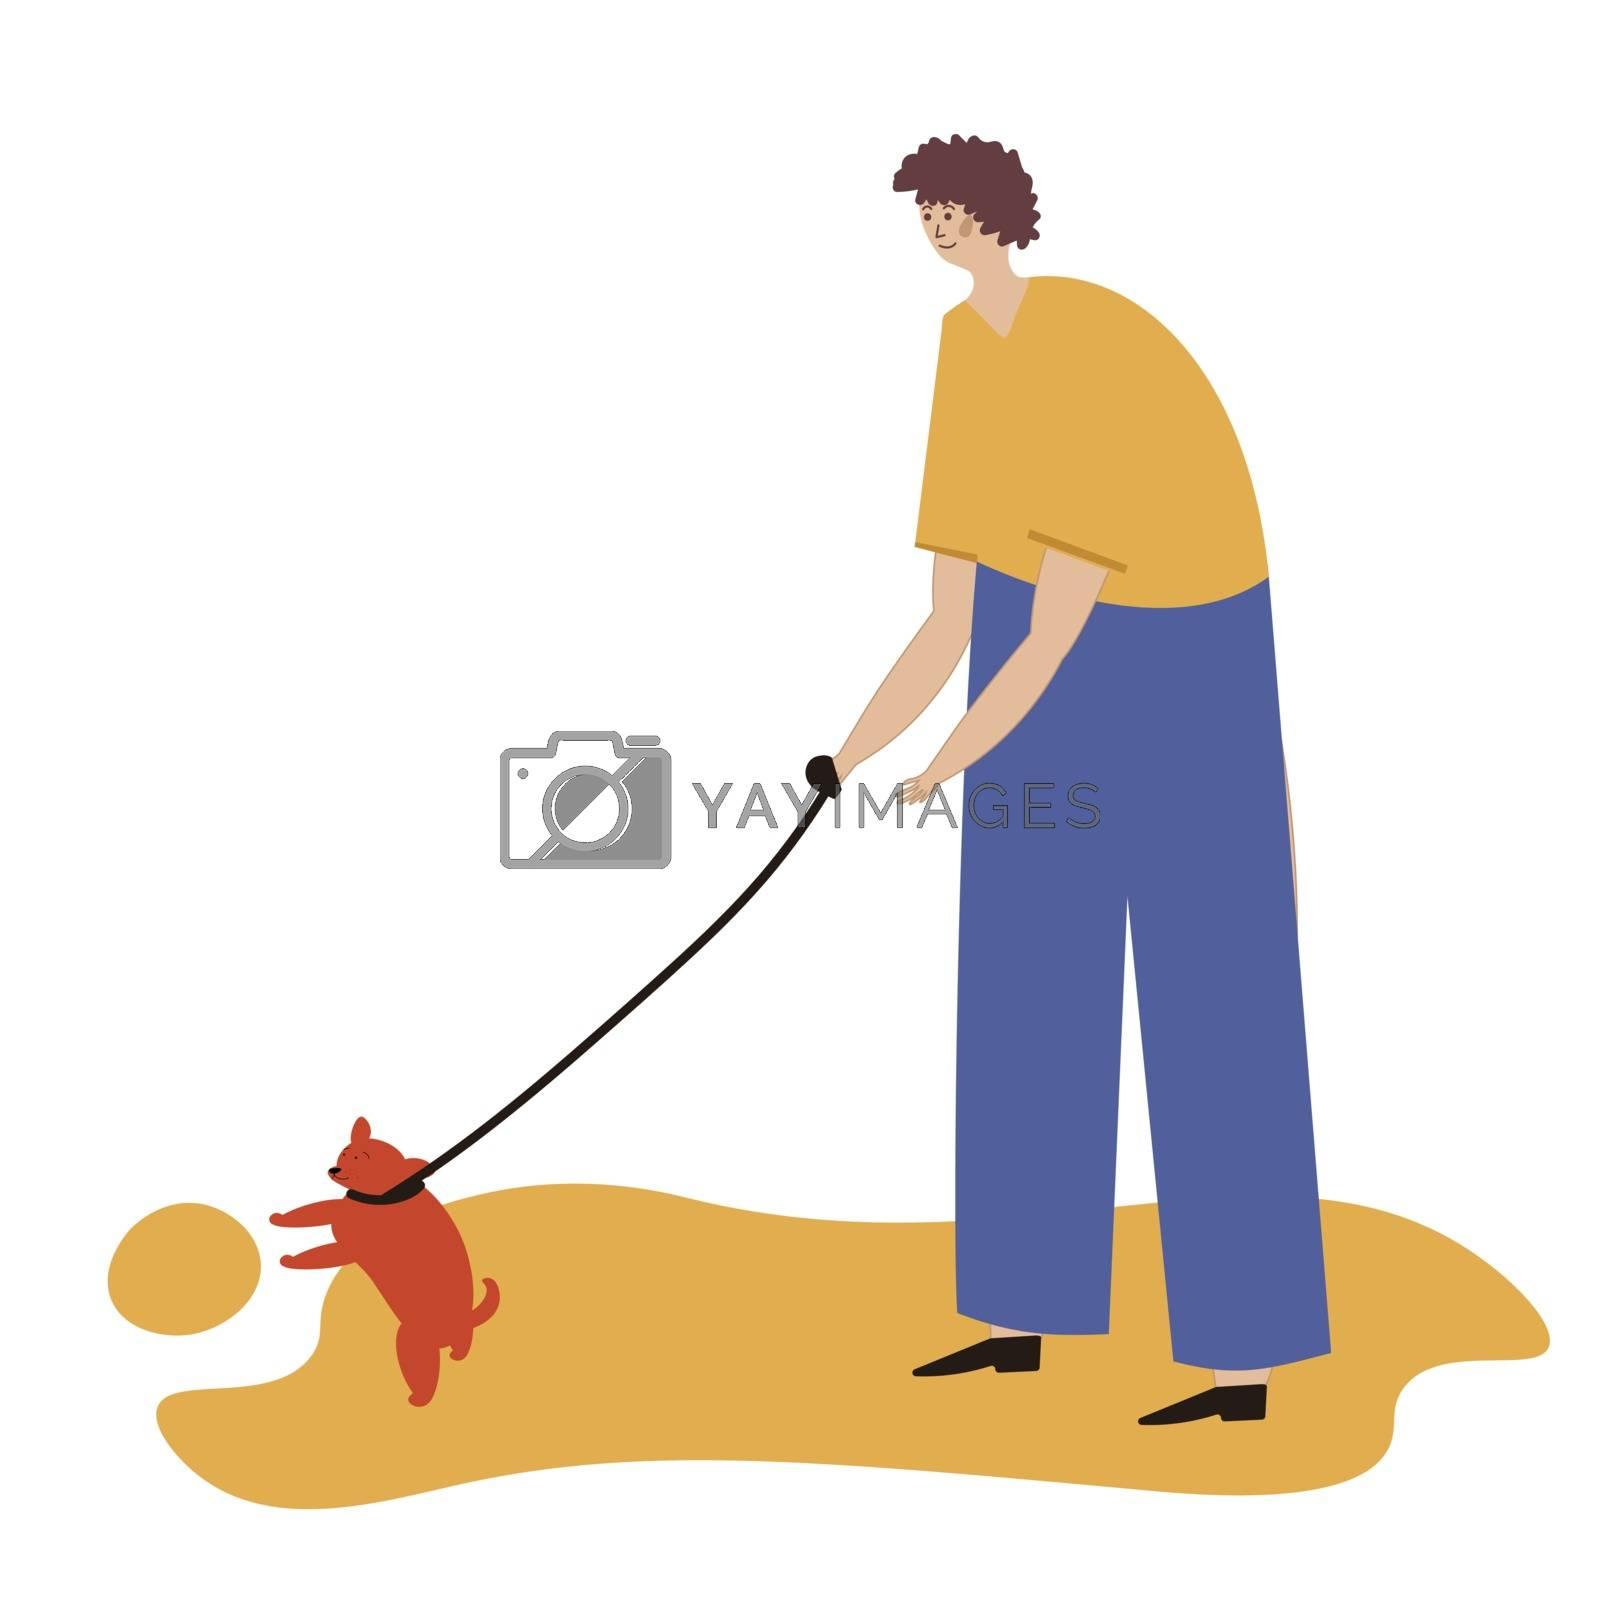 Man walking with a dog. Vector illustration for service of pet sitter, walker, vet clinic, pet care, hospital, dog shelter. Design template for poster, booklet, banner, flyer, web, advert. Man plays with a dog.